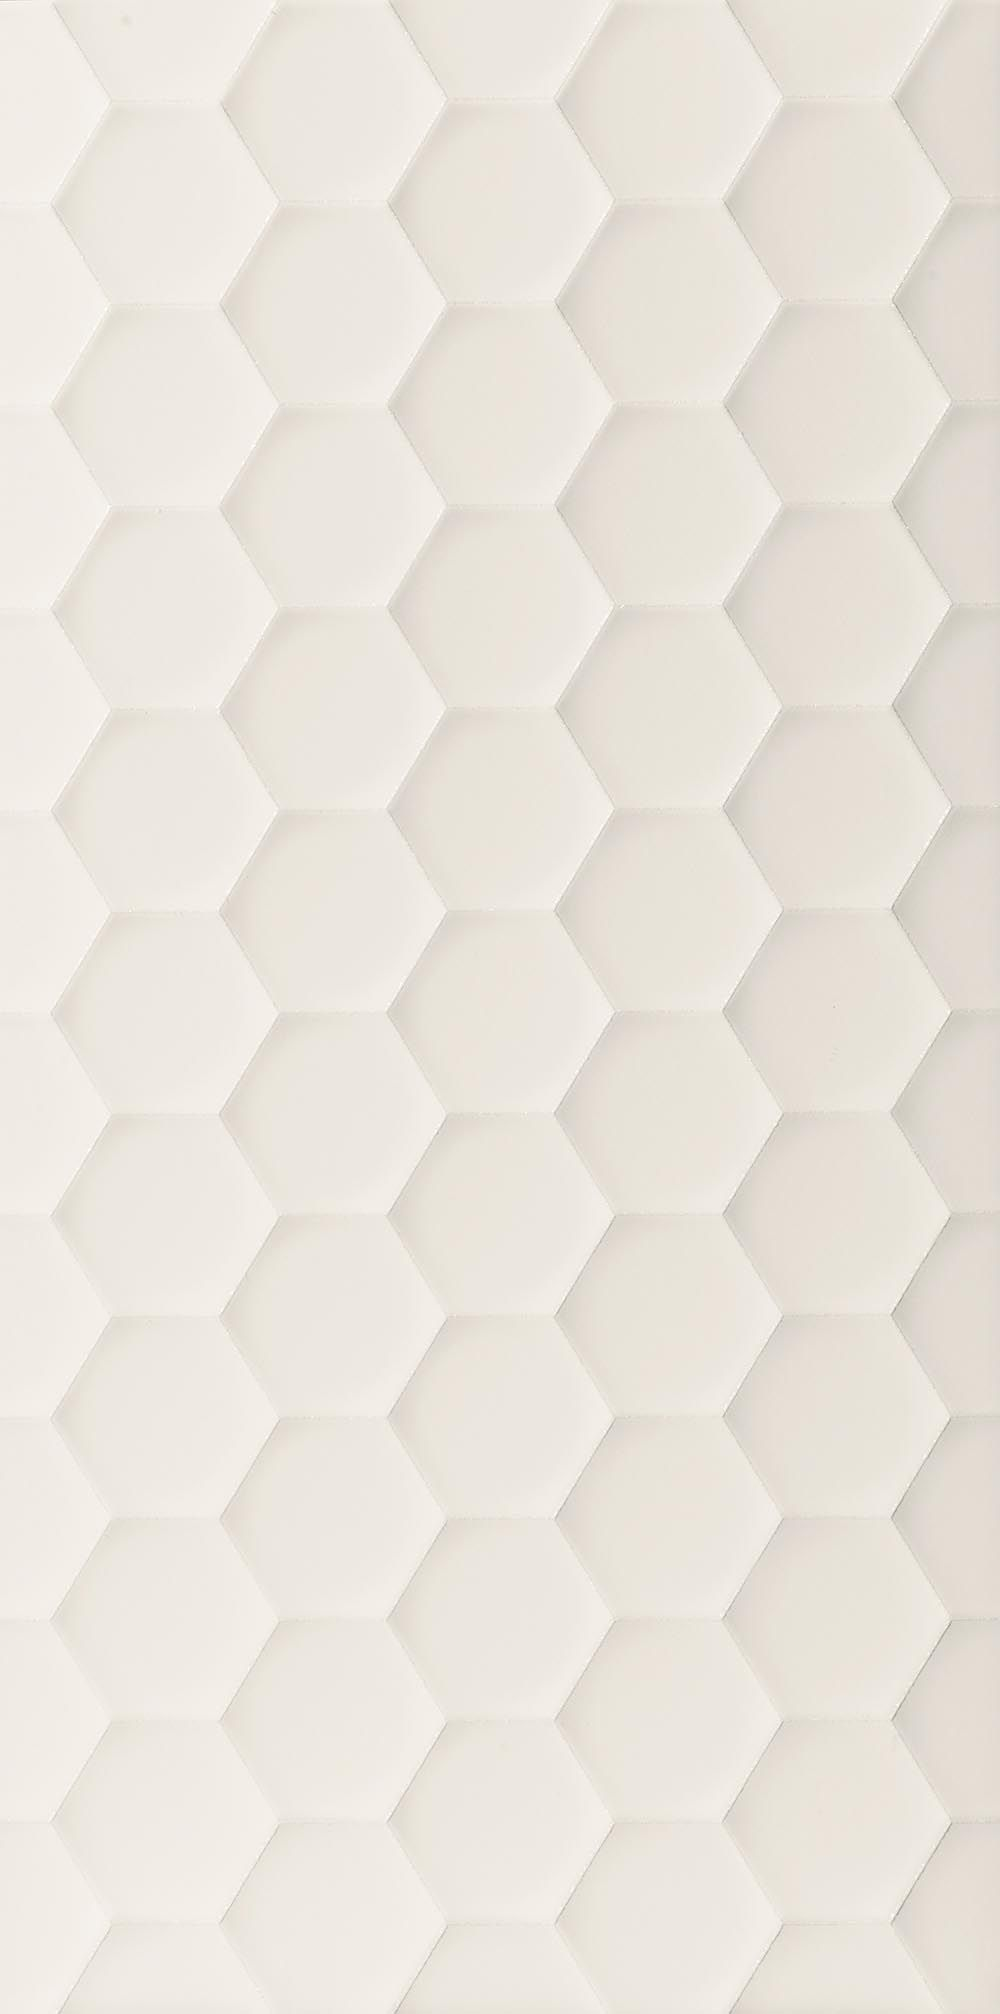 Multidimensional 3d Textured Ceramic Wall Tiles Hexagon White